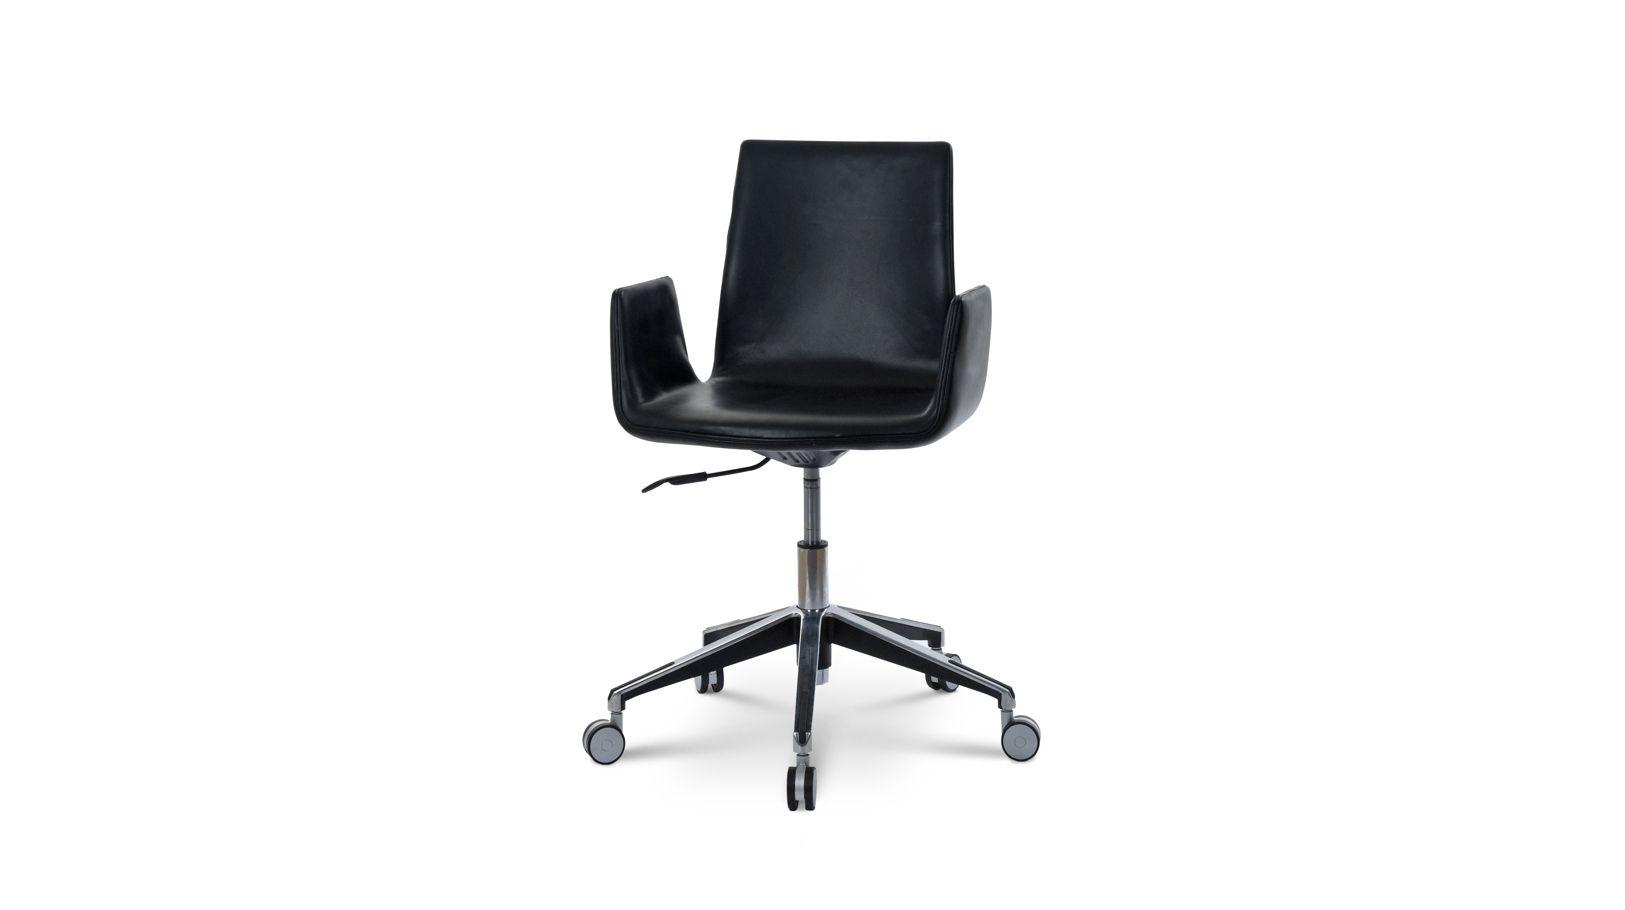 Fauteuil de bureau furtif roche bobois - Roche bobois fauteuil ...